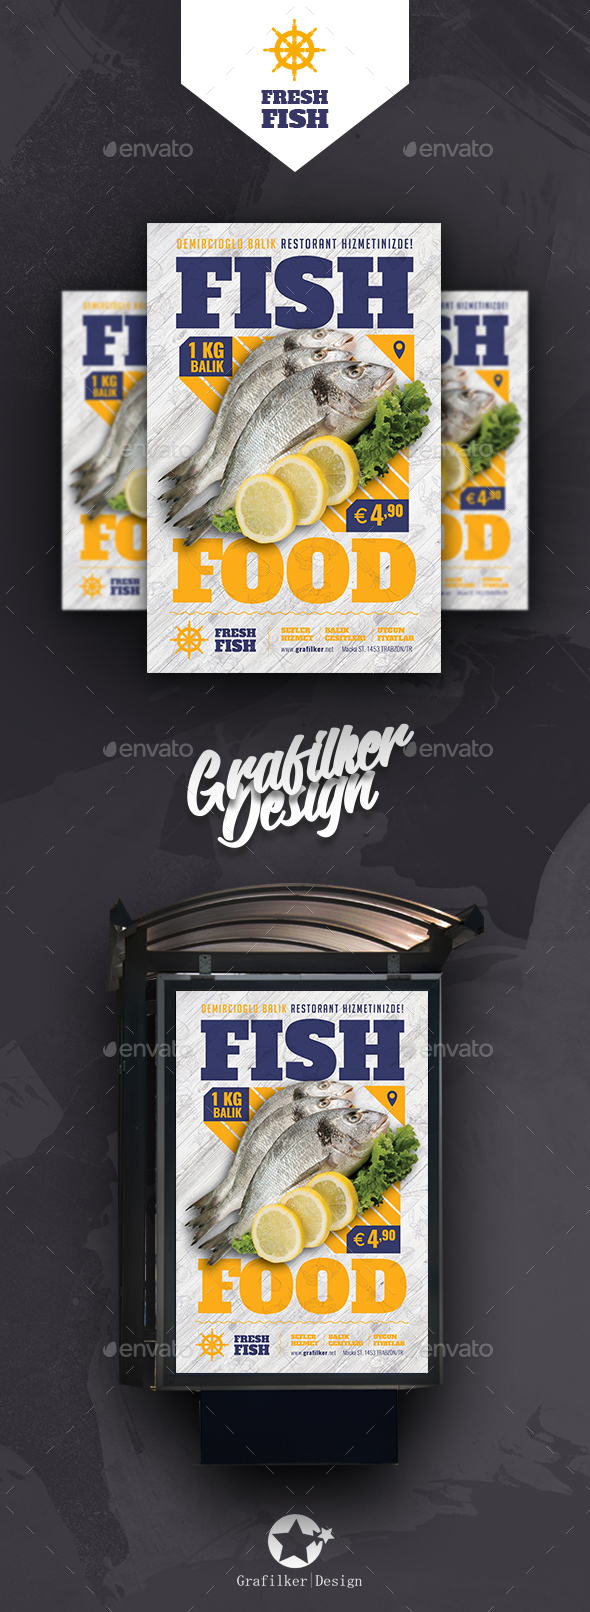 Sea Food Restaurant Poster Templates - Signage Print Templates